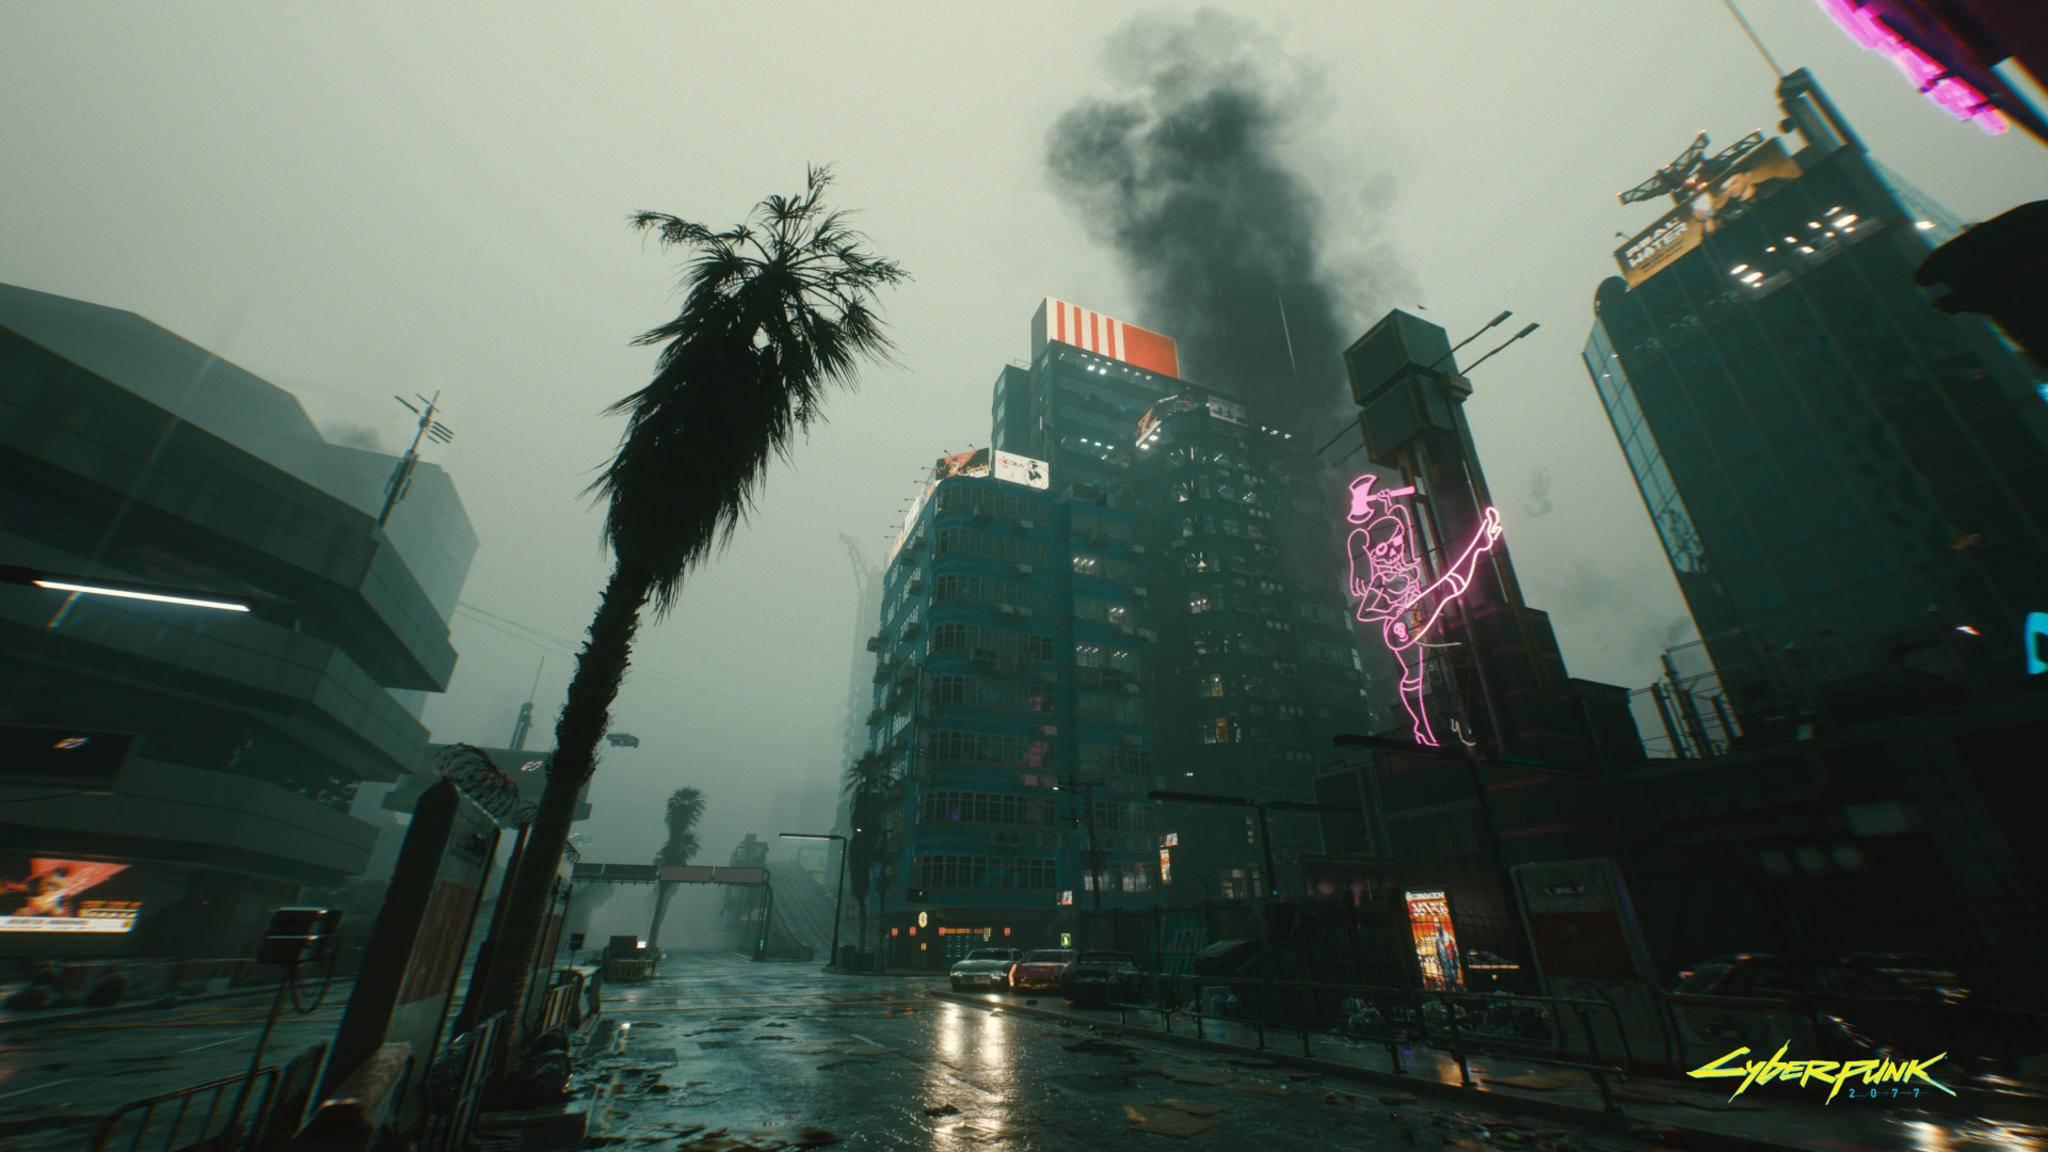 cyberpunk-2077-night-city-raytracing-rtx-exklusiv